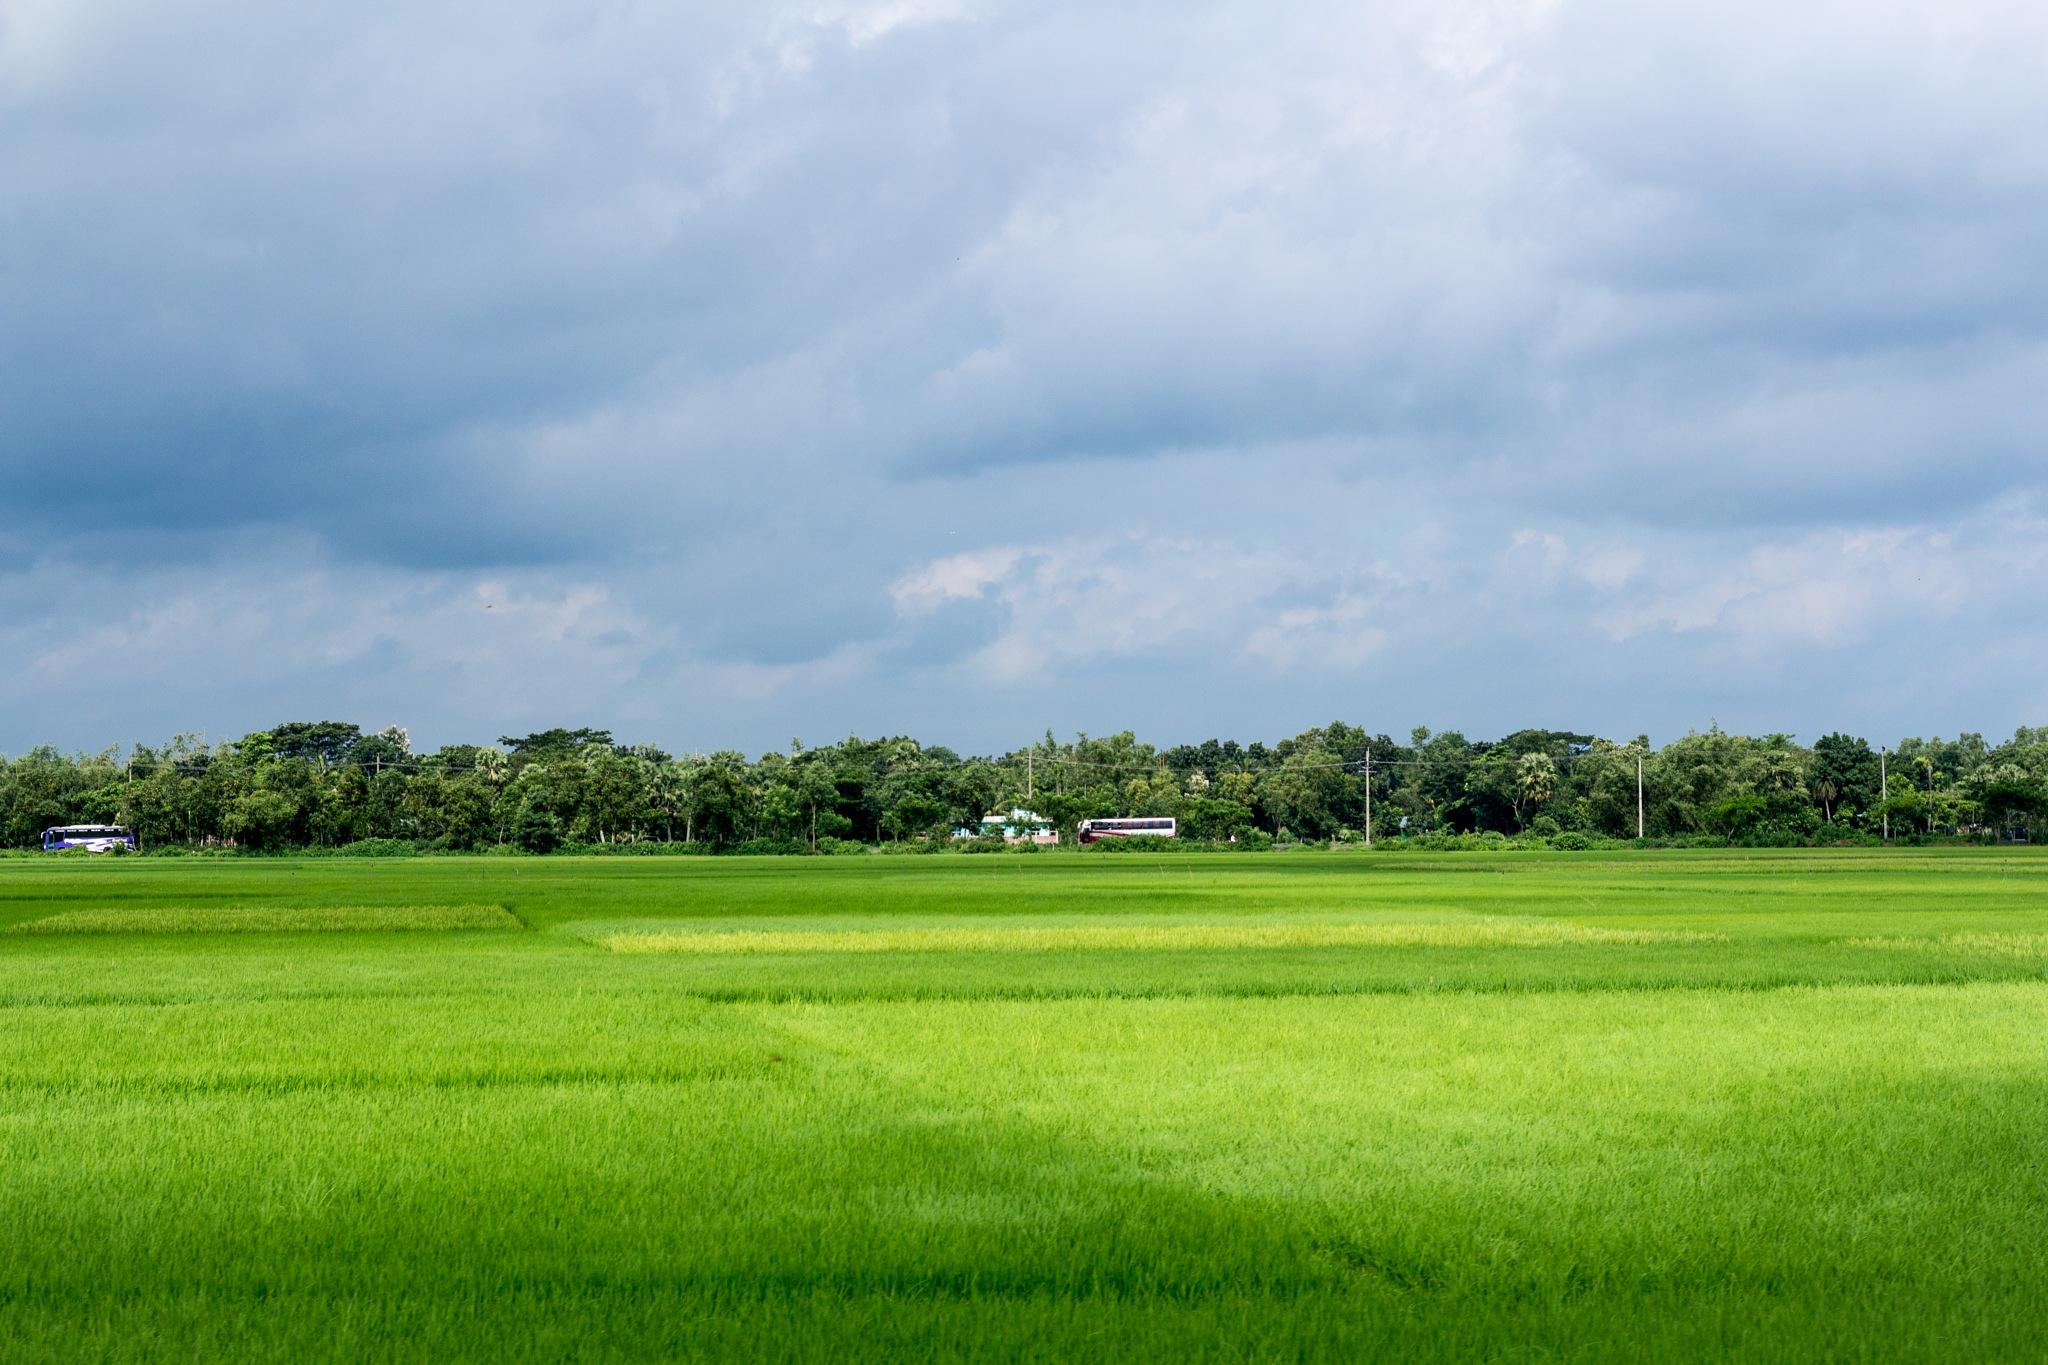 Somewhere in Bangladesh by Rubayet Tanim